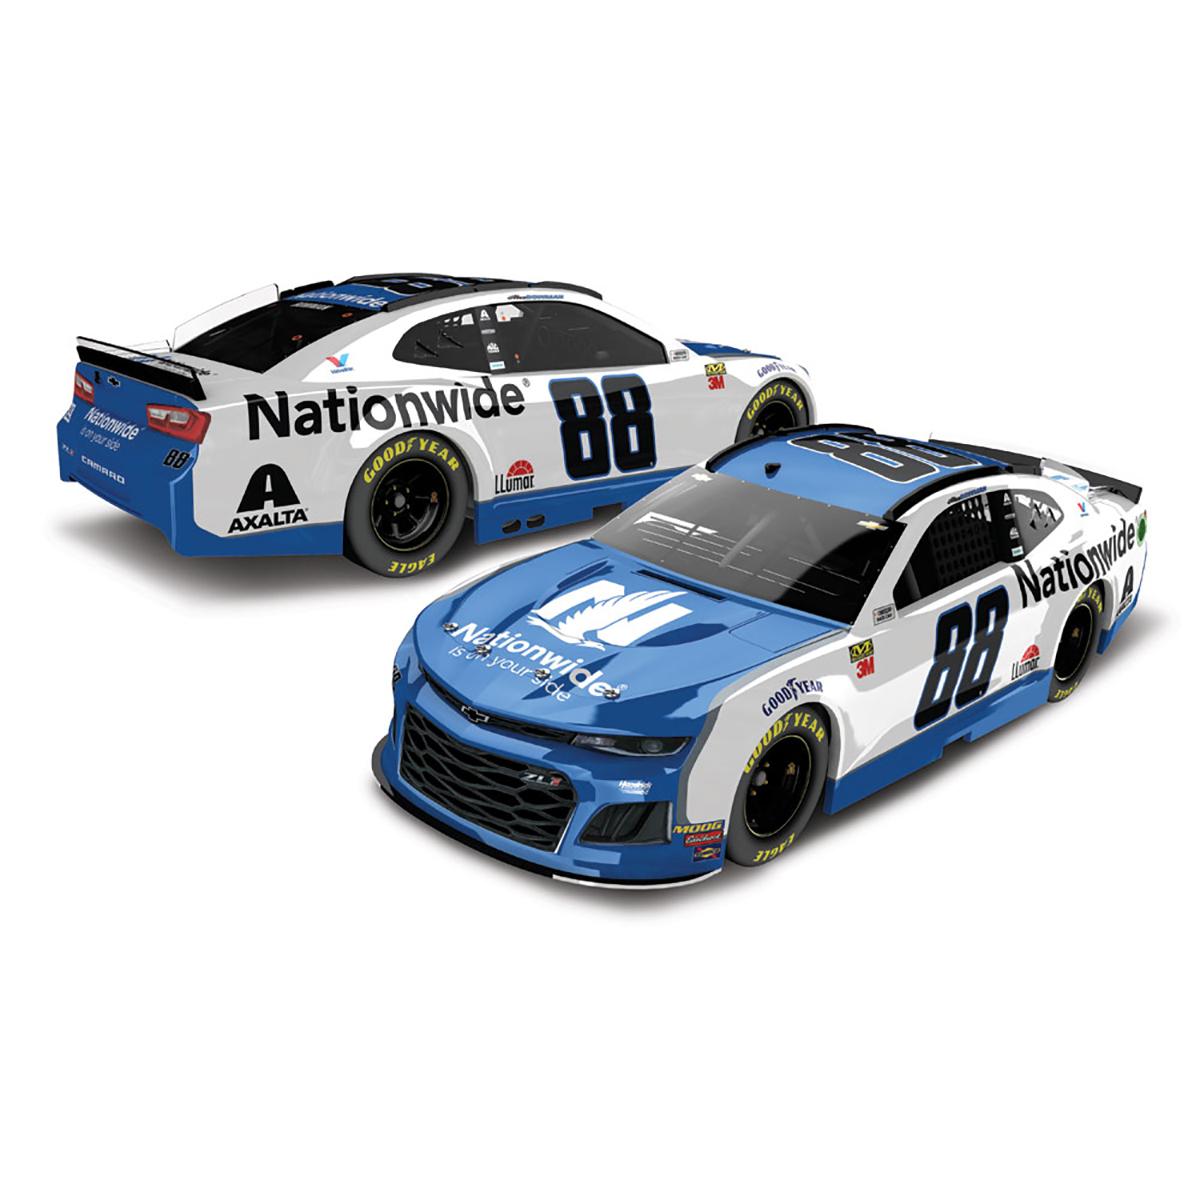 2019 #88 NASCAR Alex Bowman Nationwide 1:64 Die-Cast